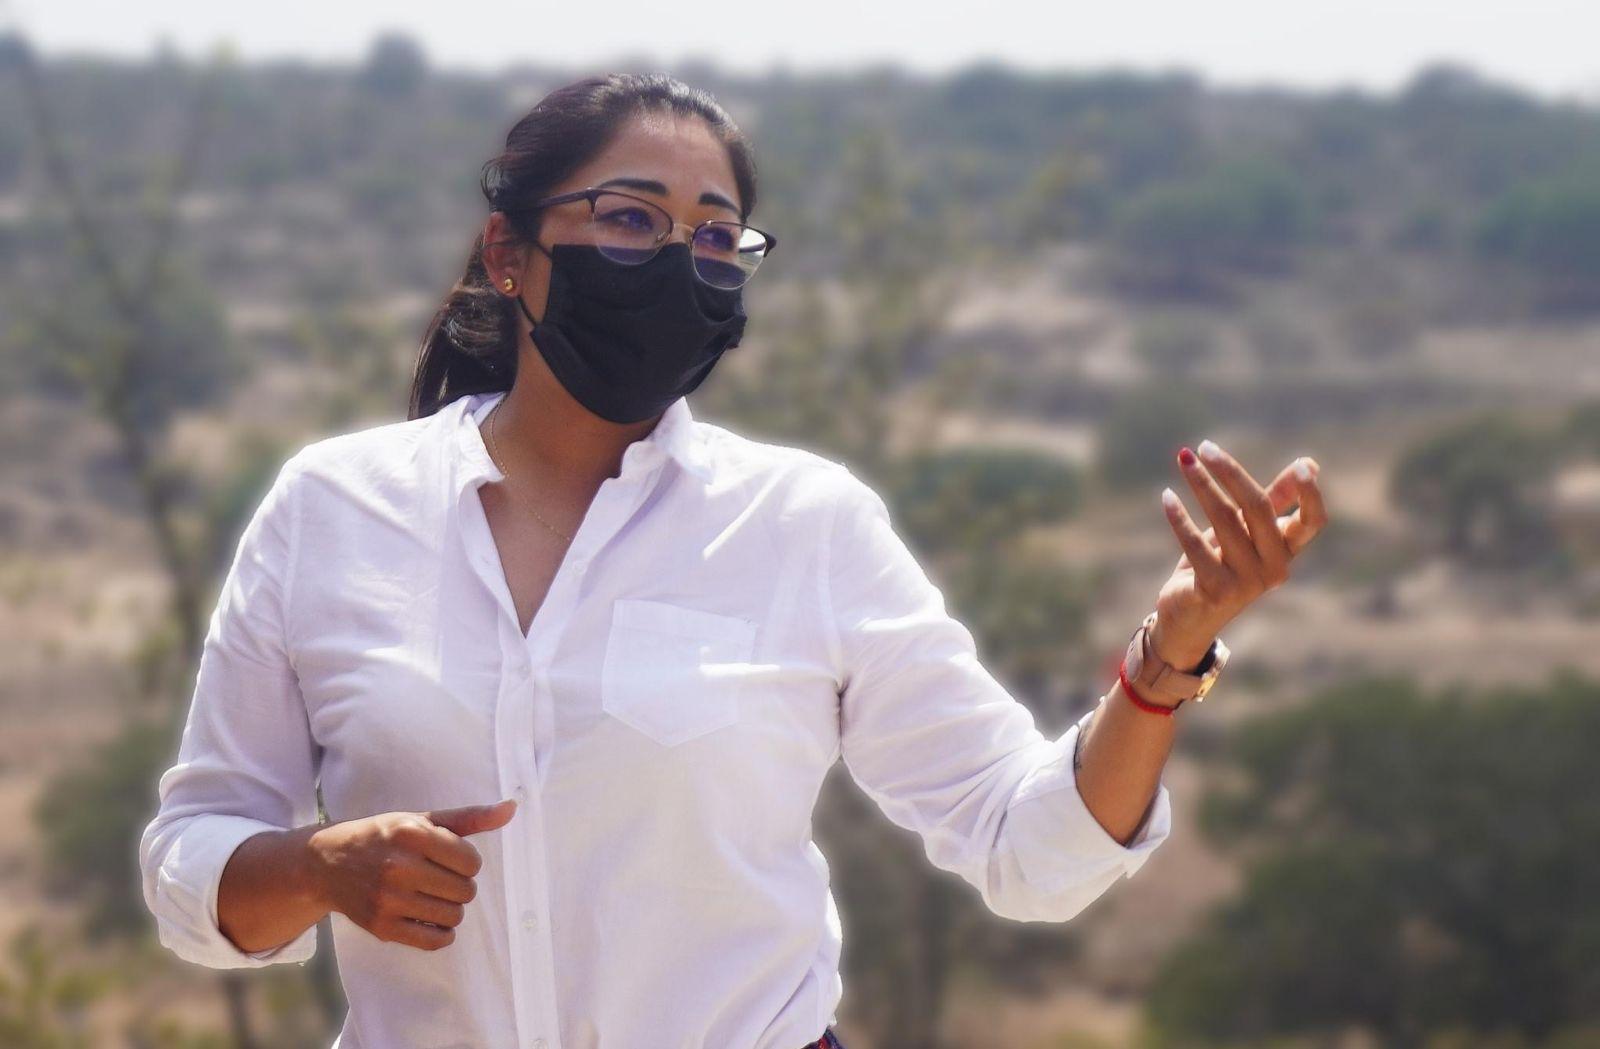 Trasladan a edil morenista de Nochixtlán a penal de Tanivet, por desaparición de activista de Oaxaca